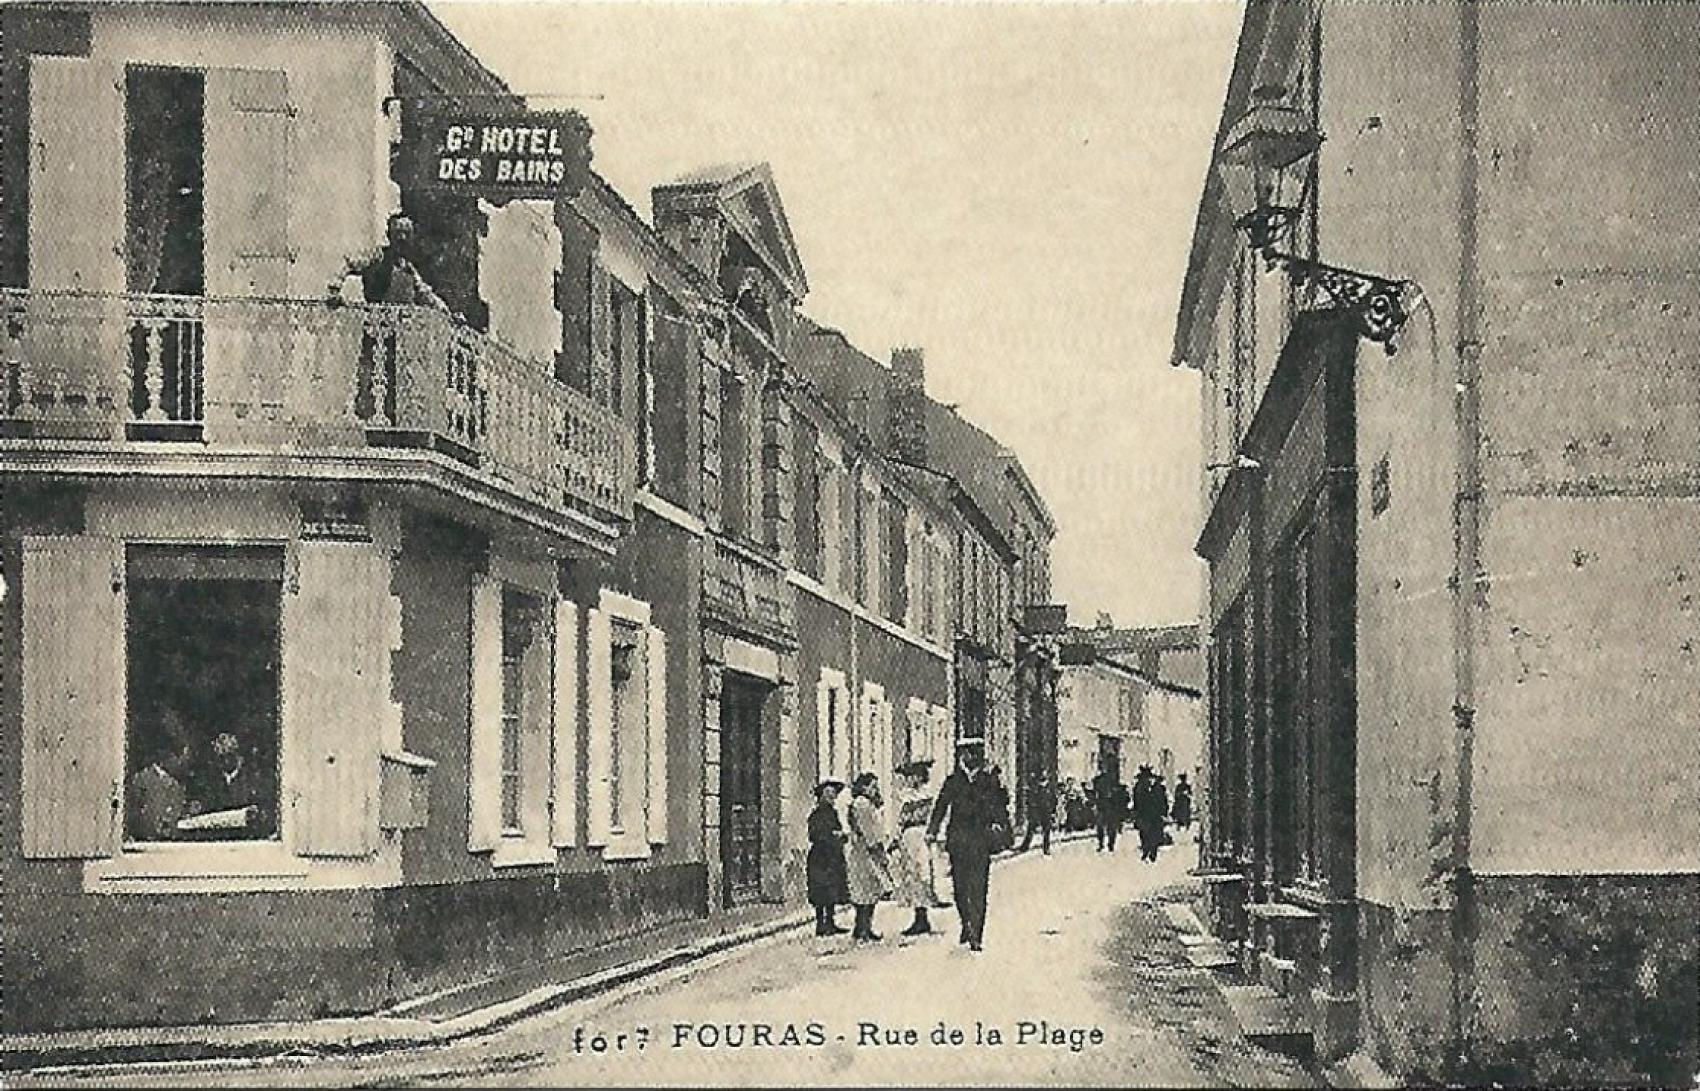 Historia fouras grand h tel des bains spa for Hotel fouras grand hotel des bains